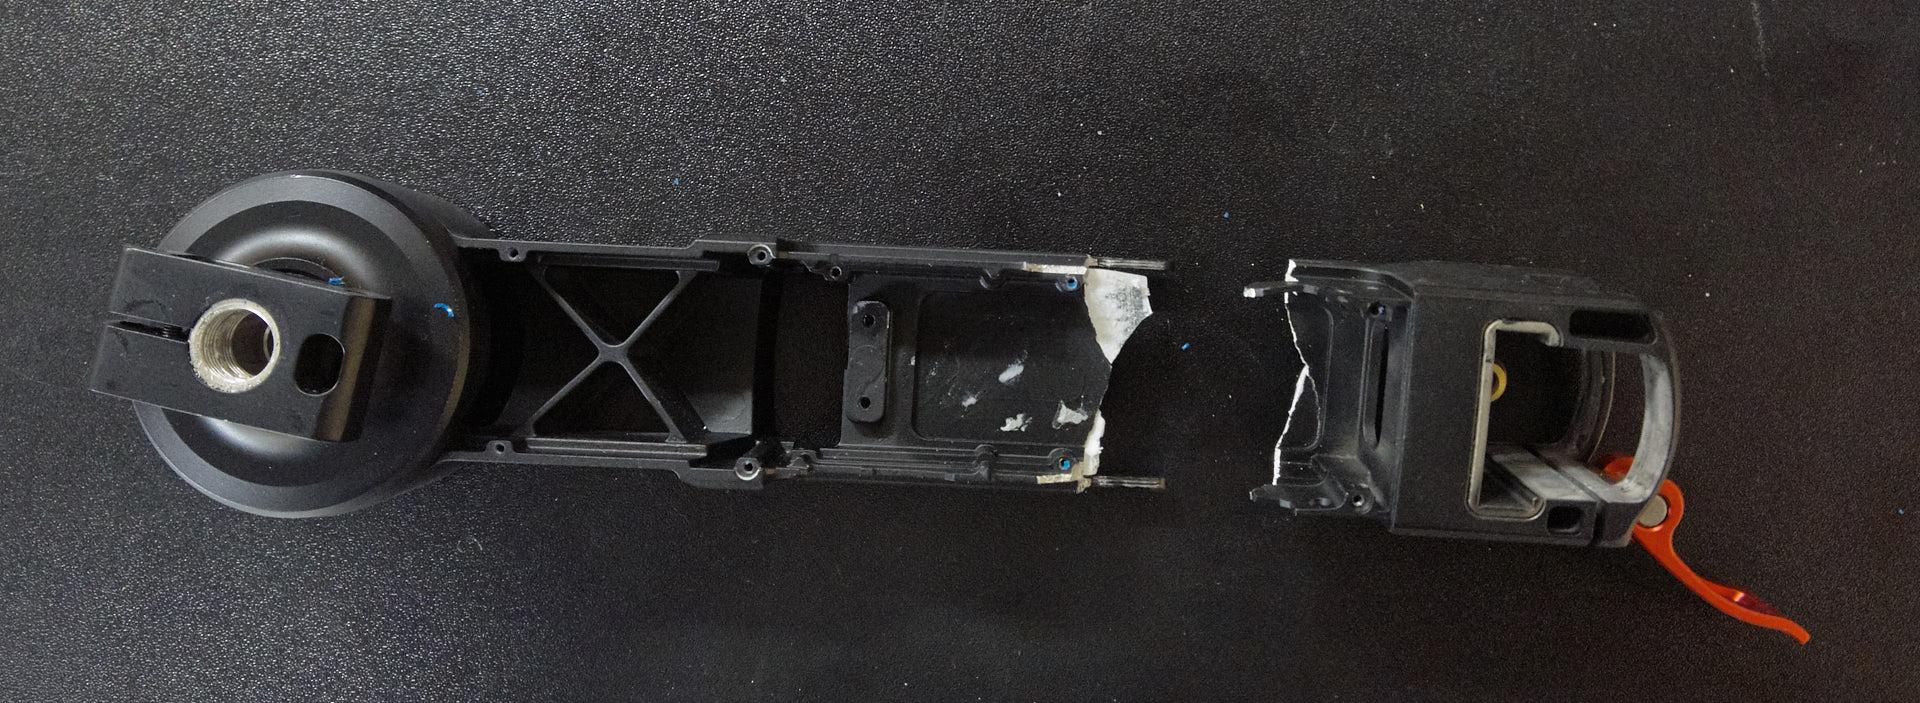 Broken Ronin M vertical arm dismantled.